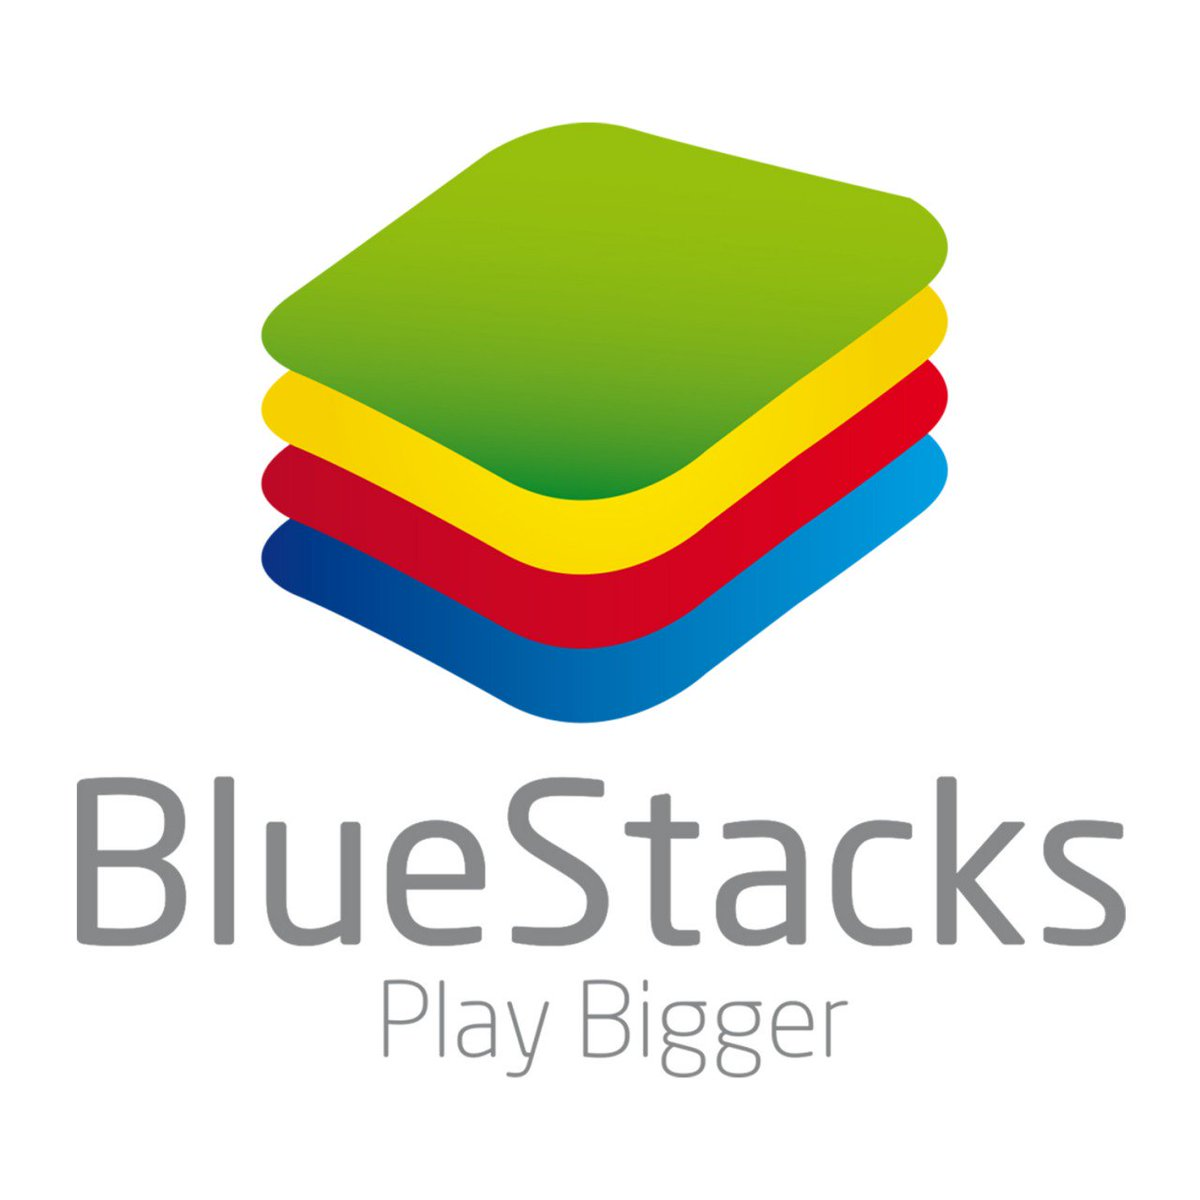 bluestacks для windows 7 через торрент